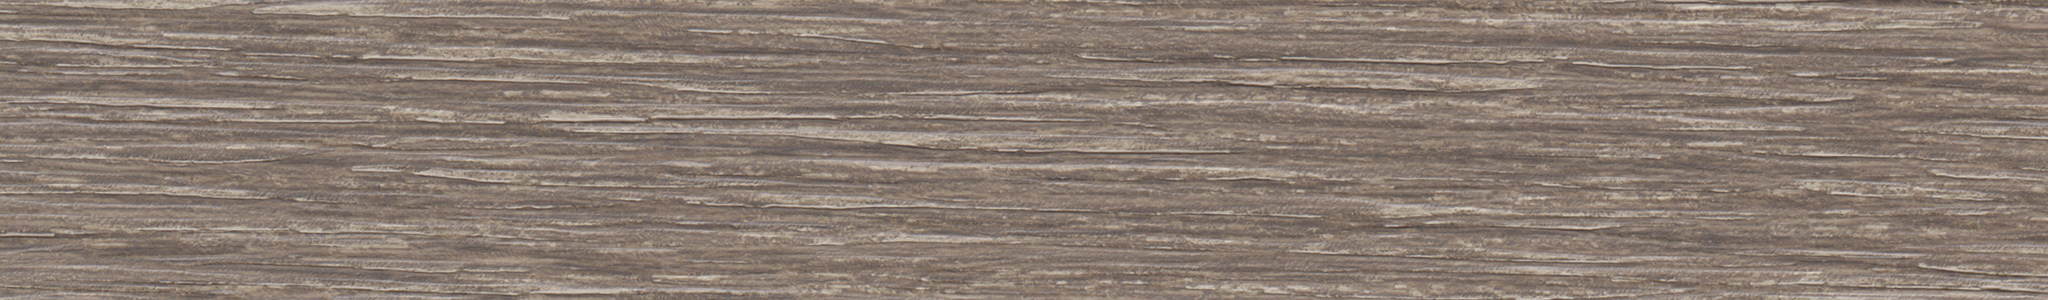 HD 242379 ABS hrana dub hnědý gravír